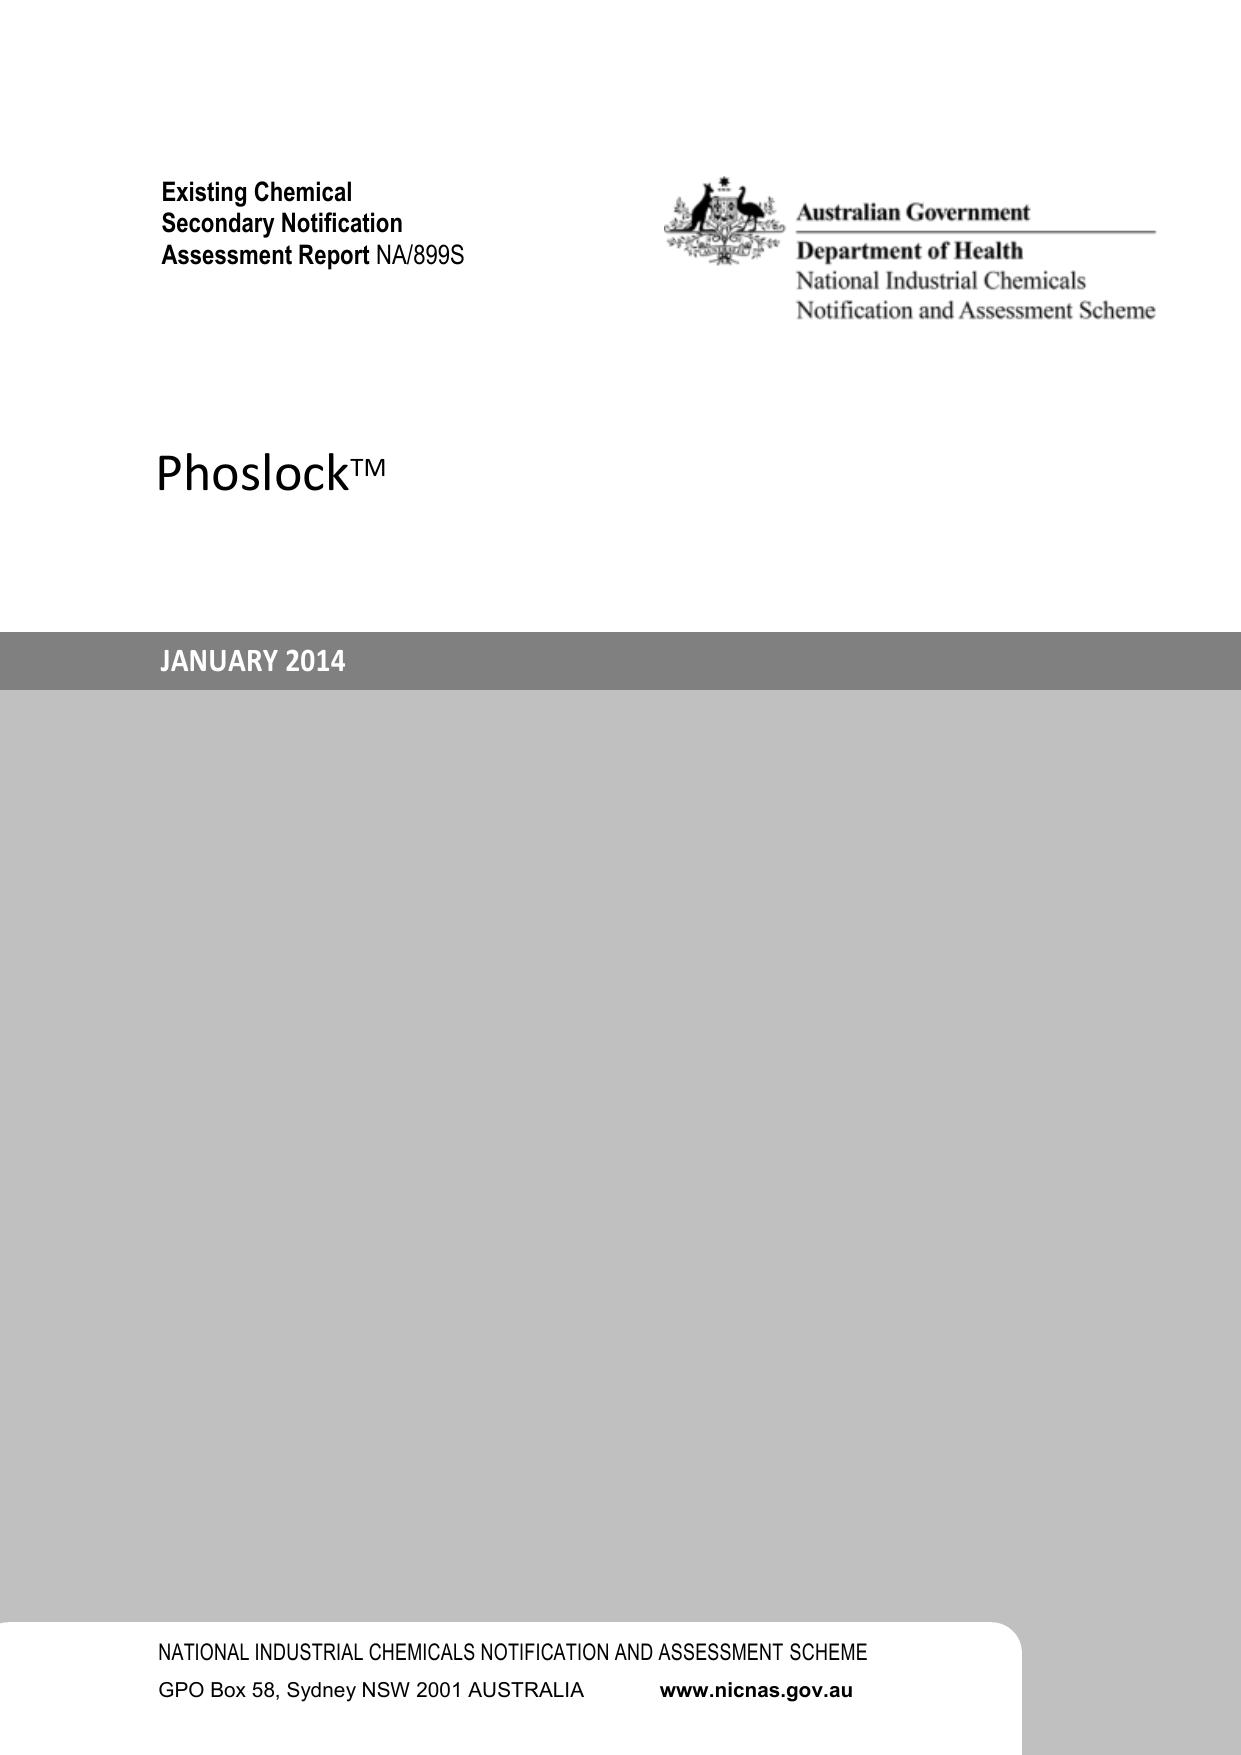 Phoslock™ (Lanthanum Modified Clay)